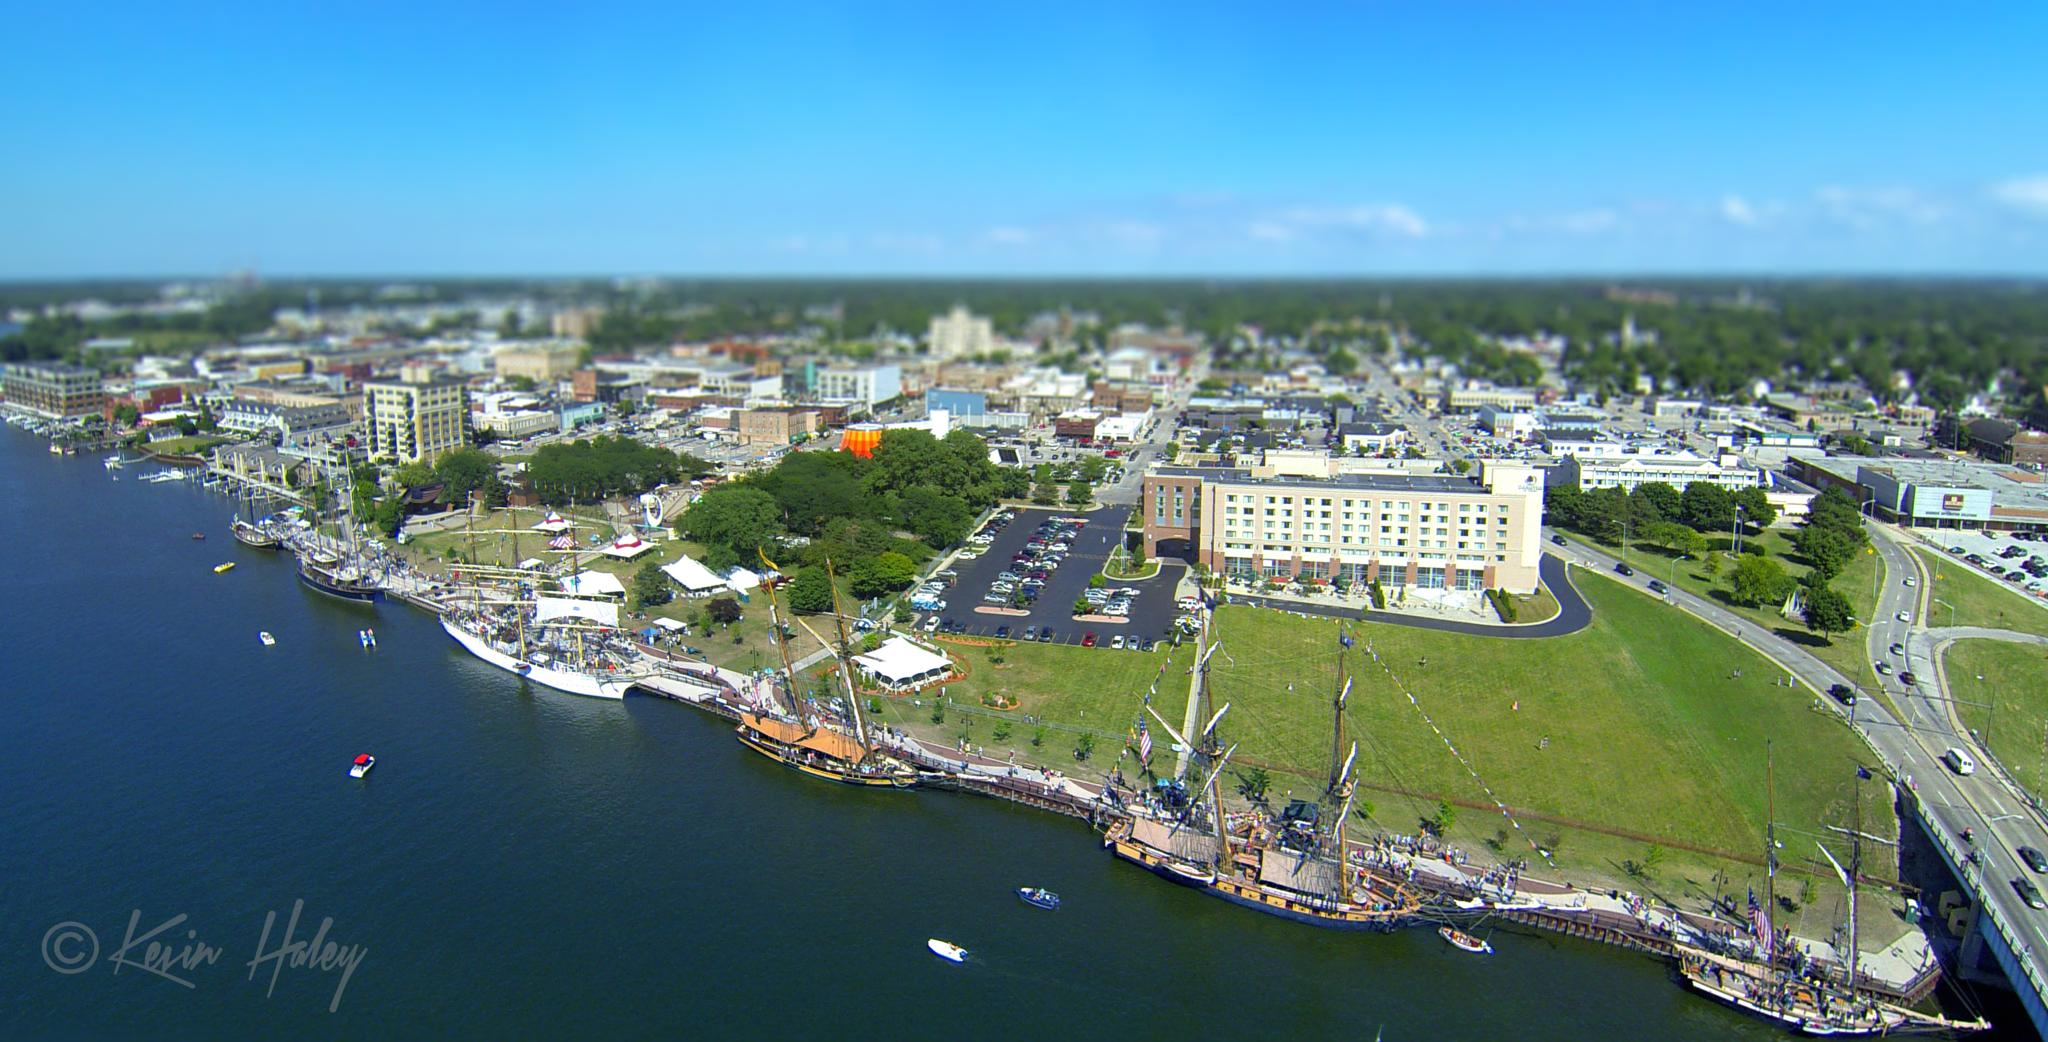 Miniature Tallships Bay City Mi. by contact.kevinhaley